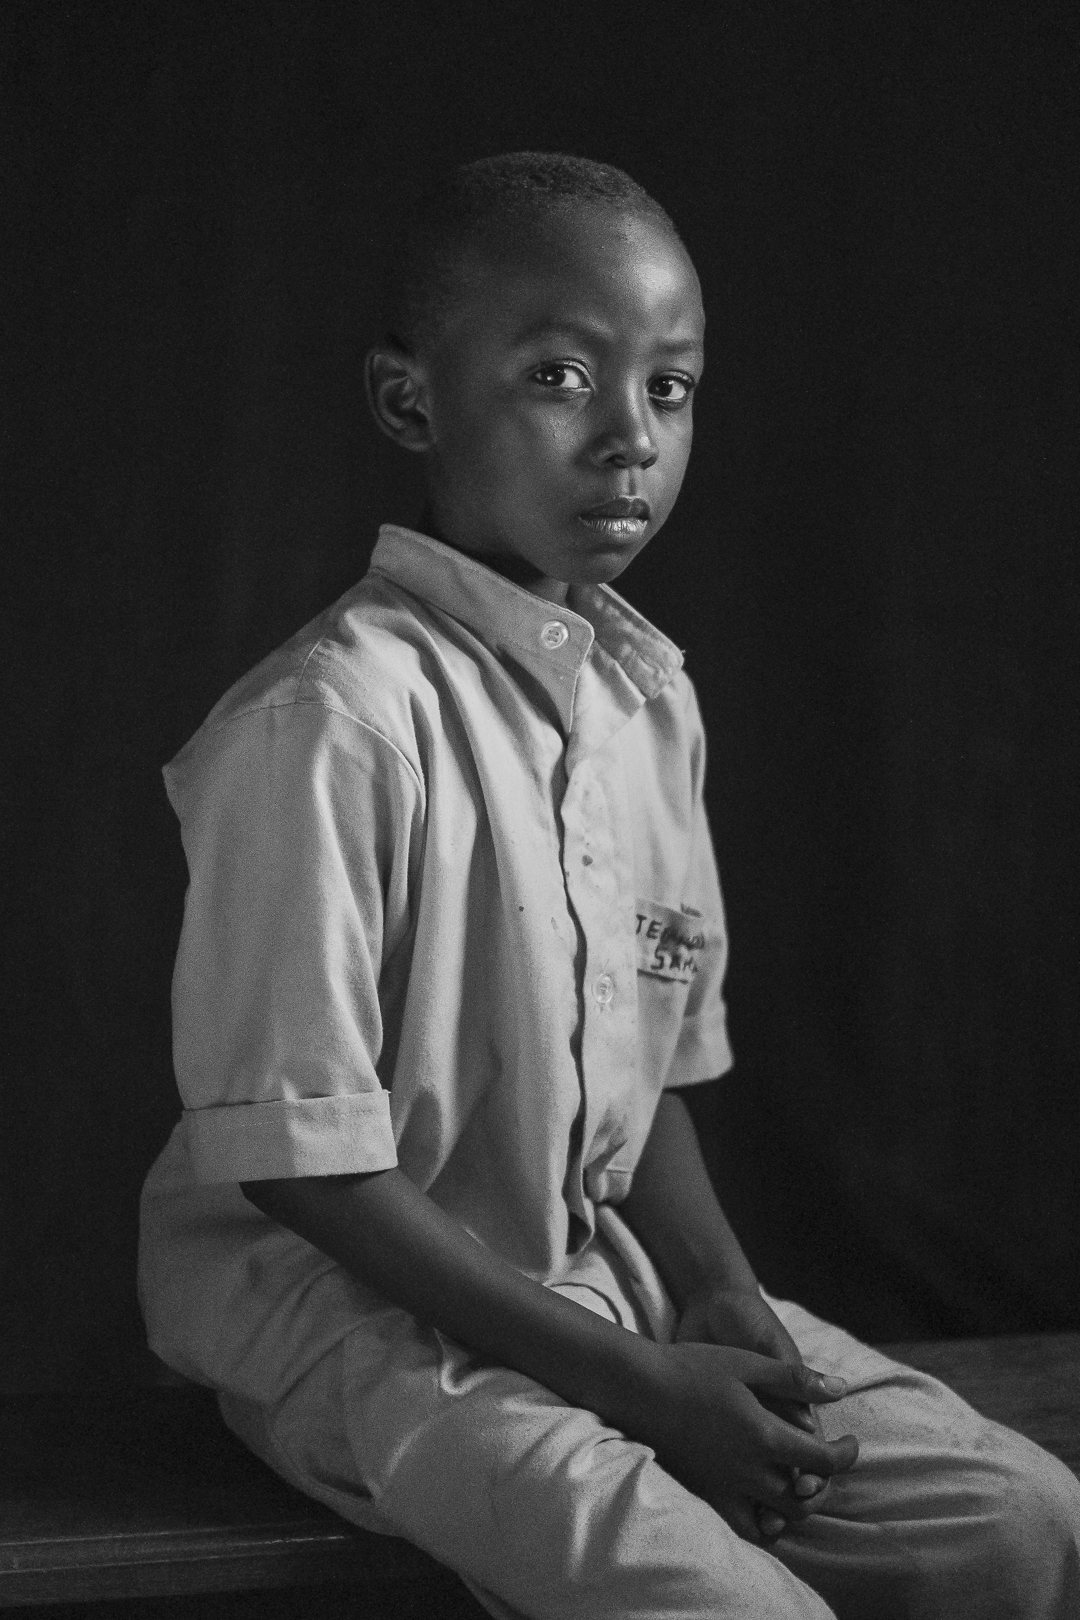 Saha | 7 years old